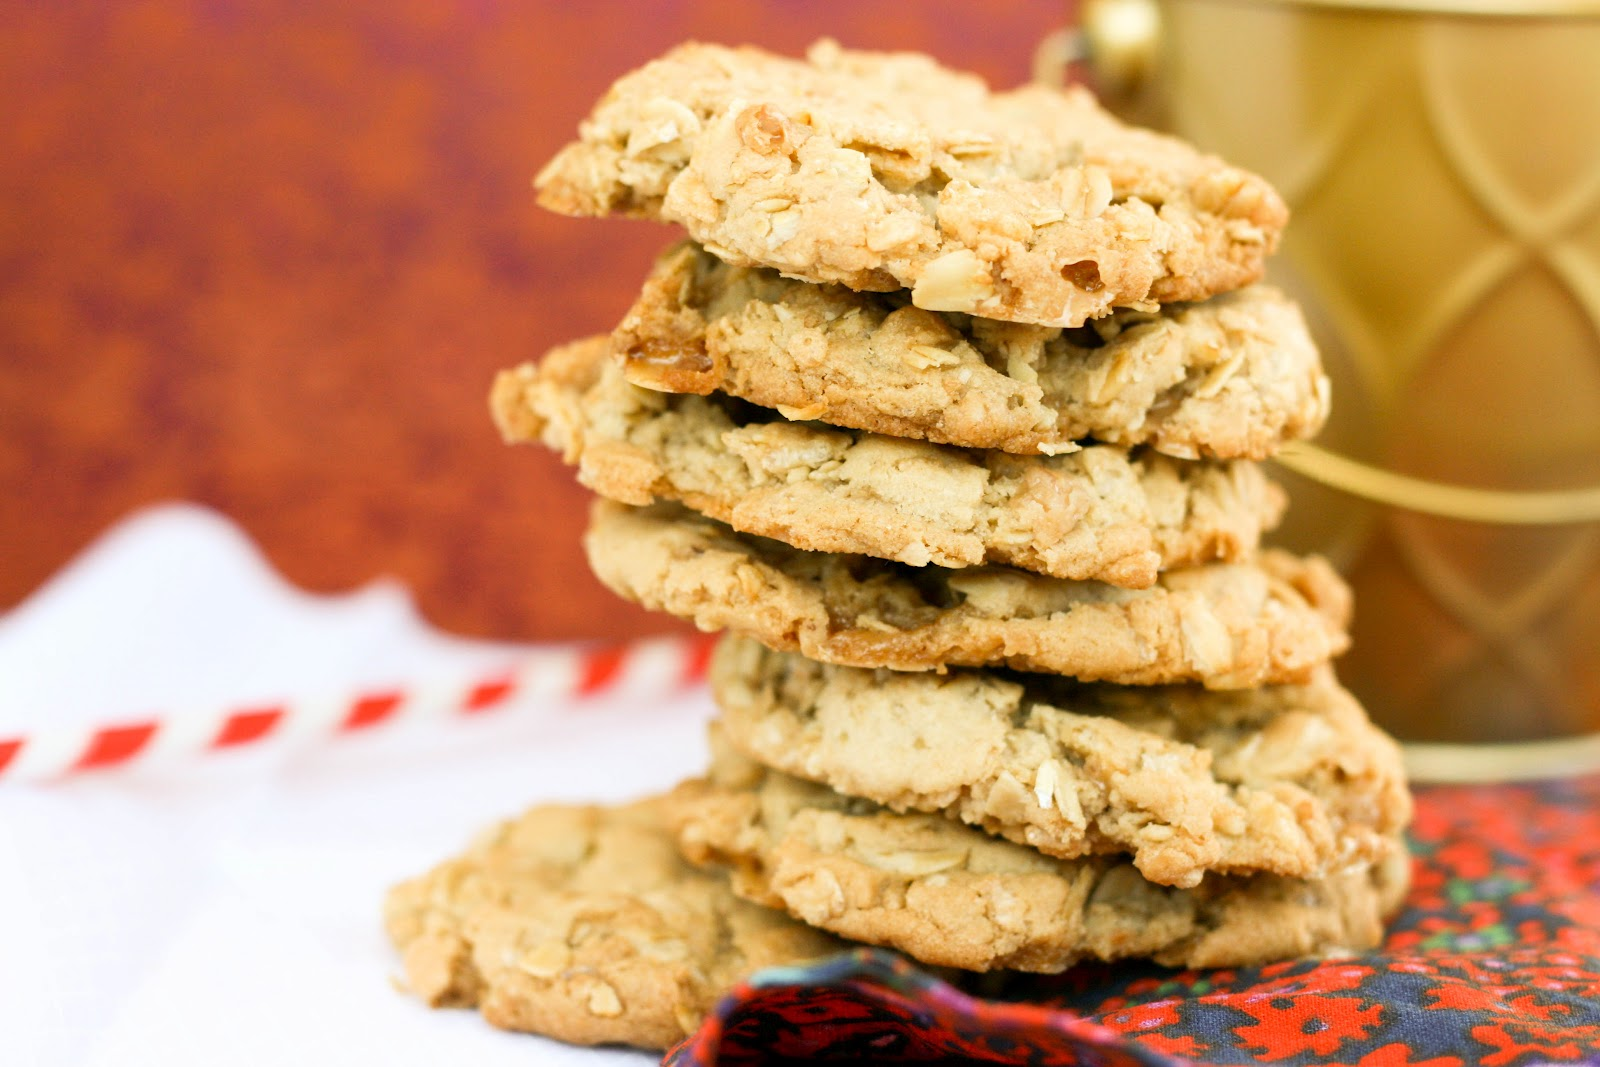 Crispy Oatmeal Toffee Cookies | Krissy's Creations